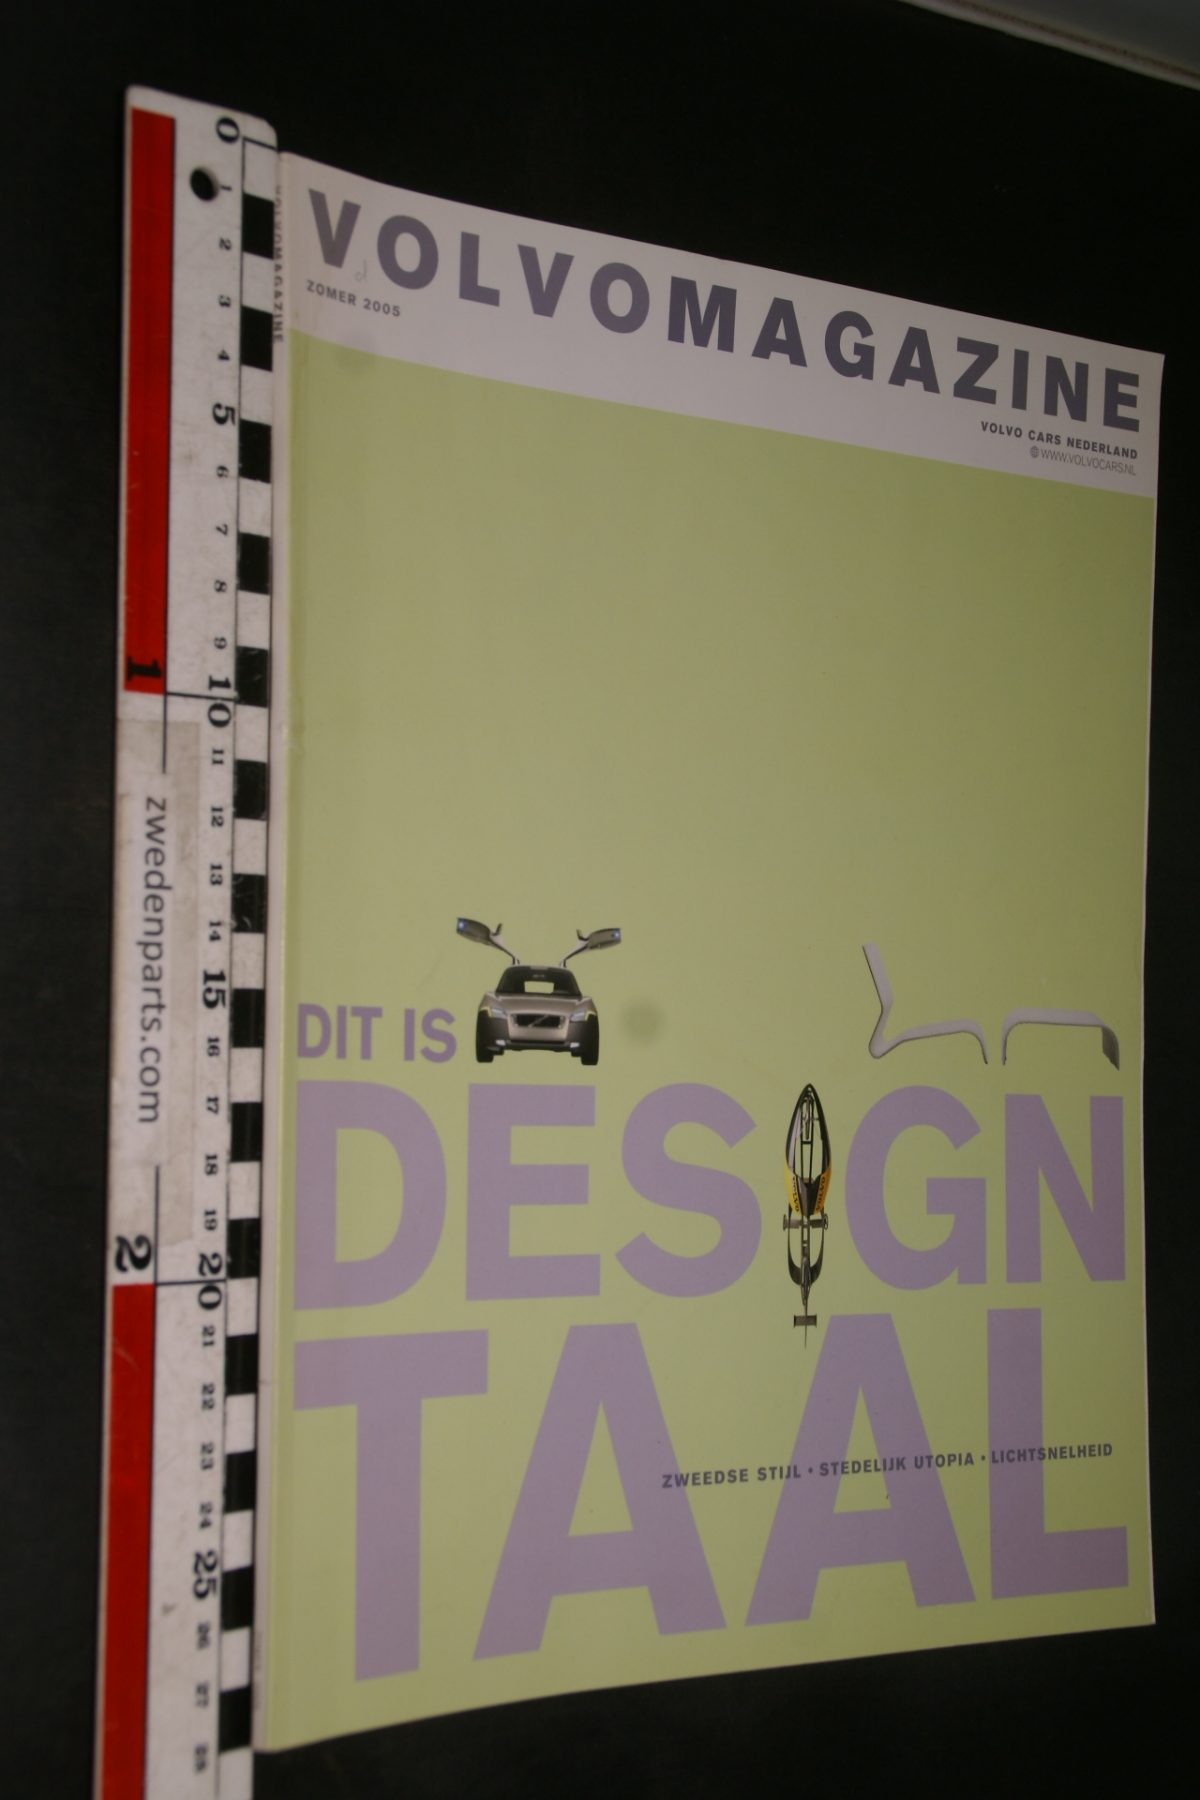 DSC04188 2005 zomer tijdschrift Volvomagazine design